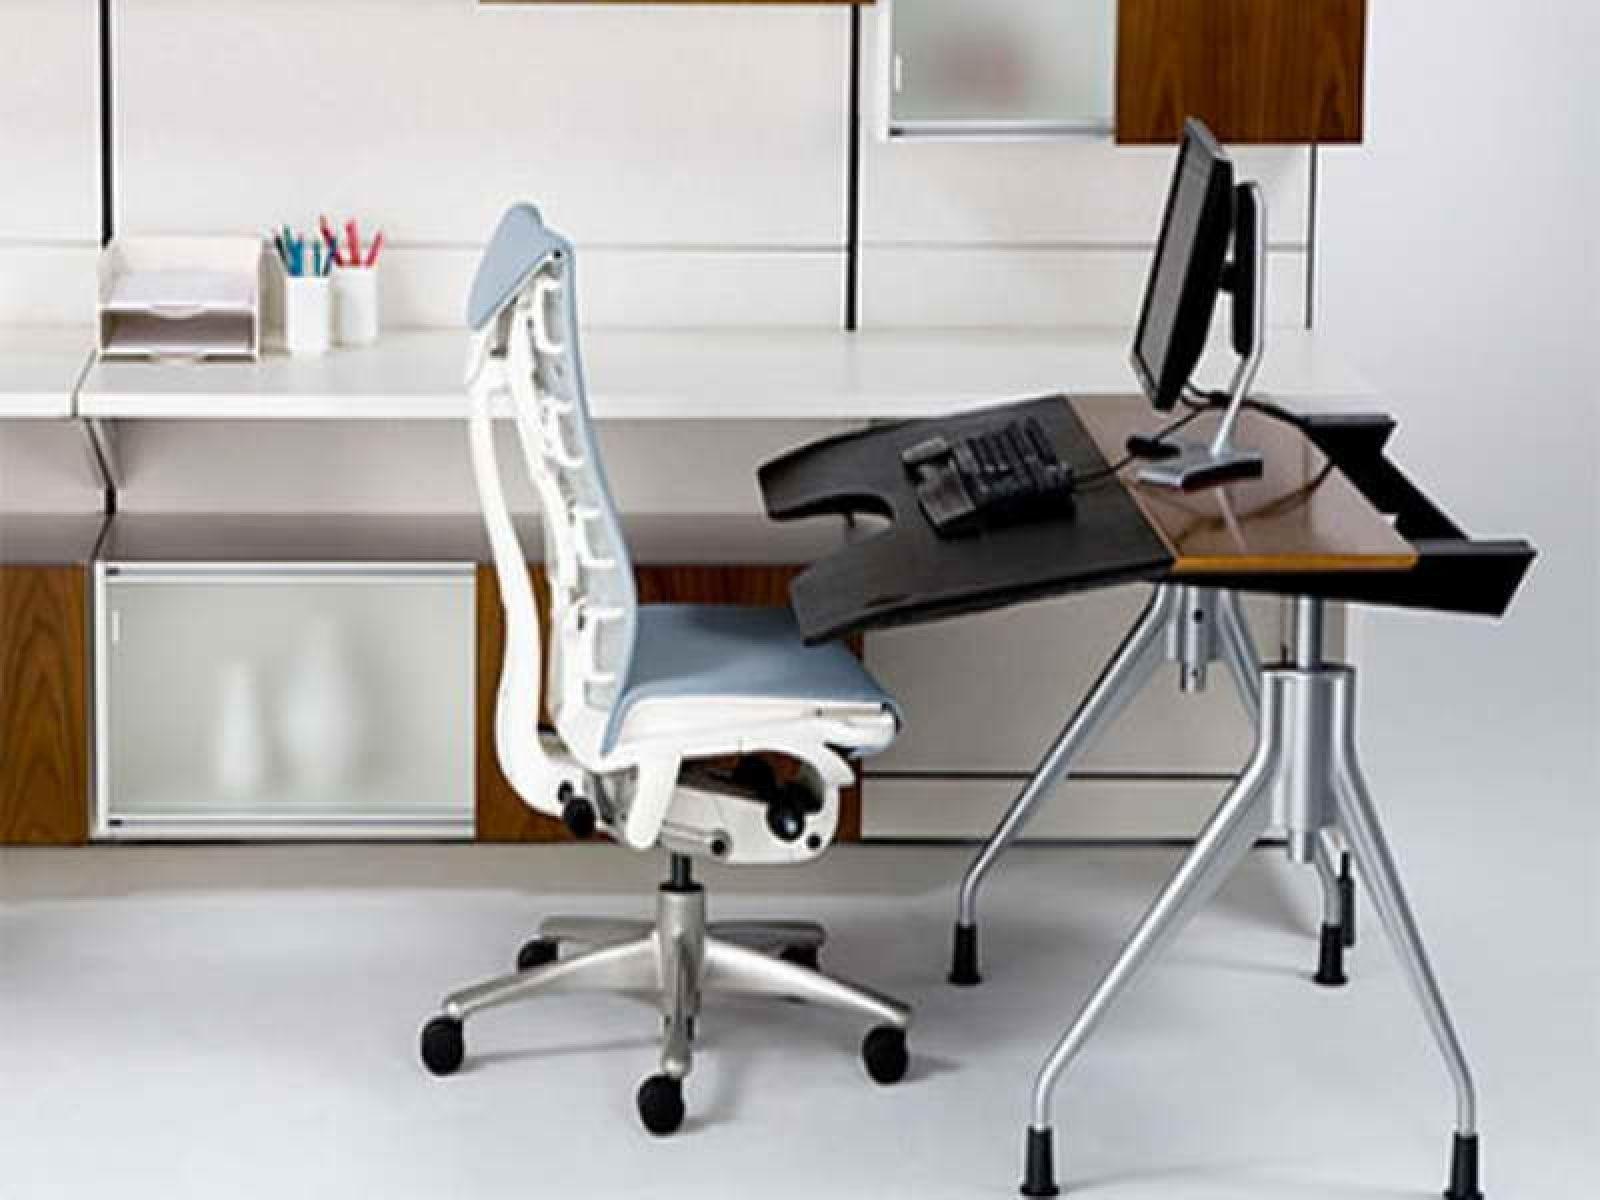 ergonomic computer desk office chair ergonomic furniture pinterest rh pinterest com